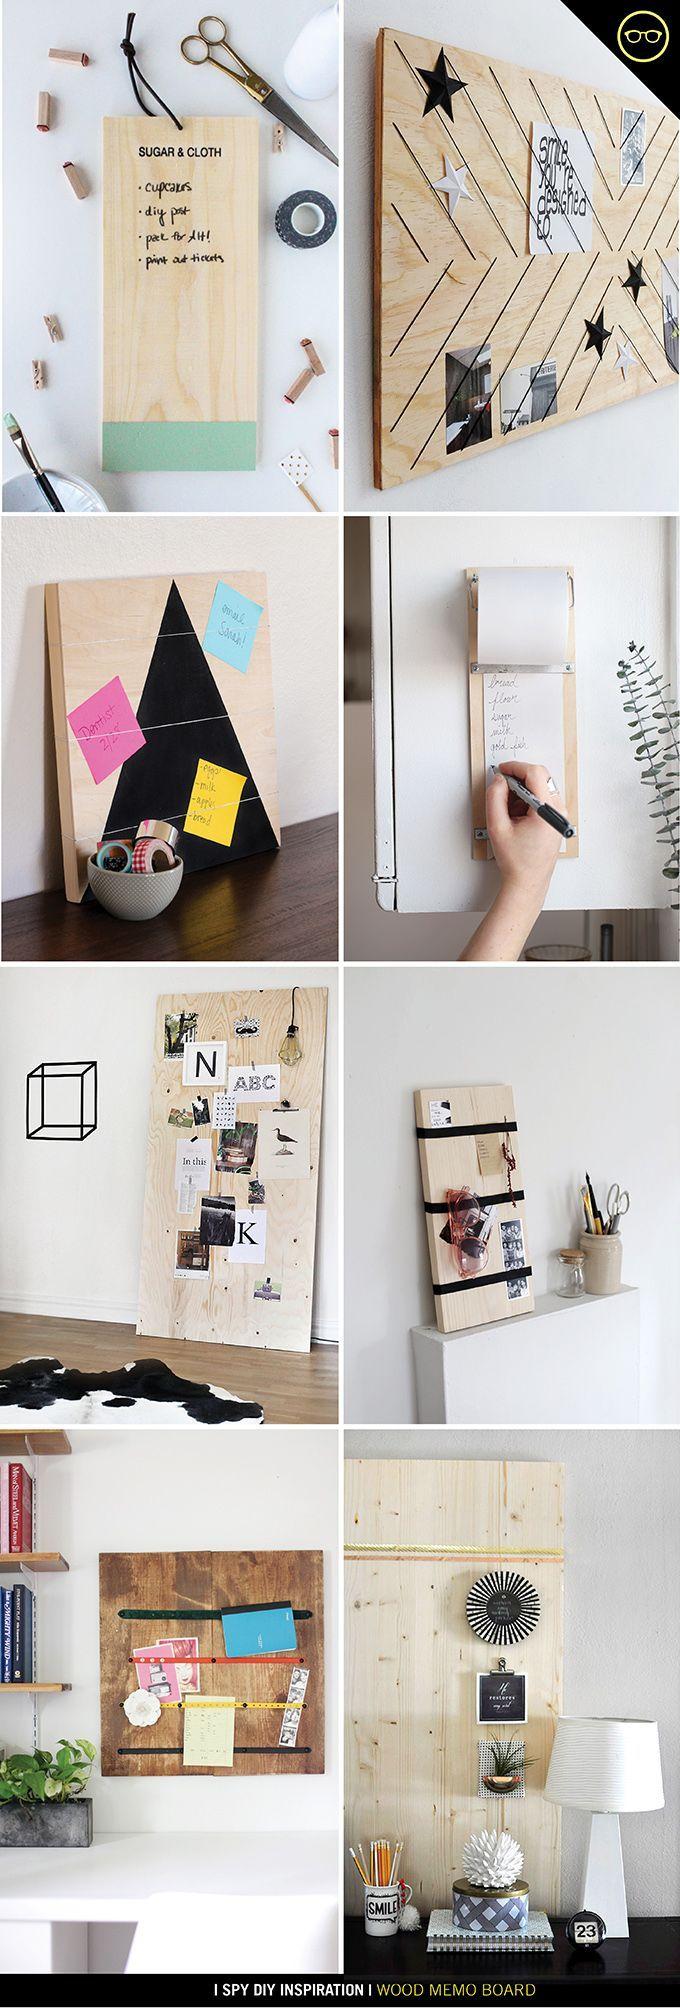 DIY INSPIRATION   WOOD MEMO BOARD   I Spy DIY   Bloglovin